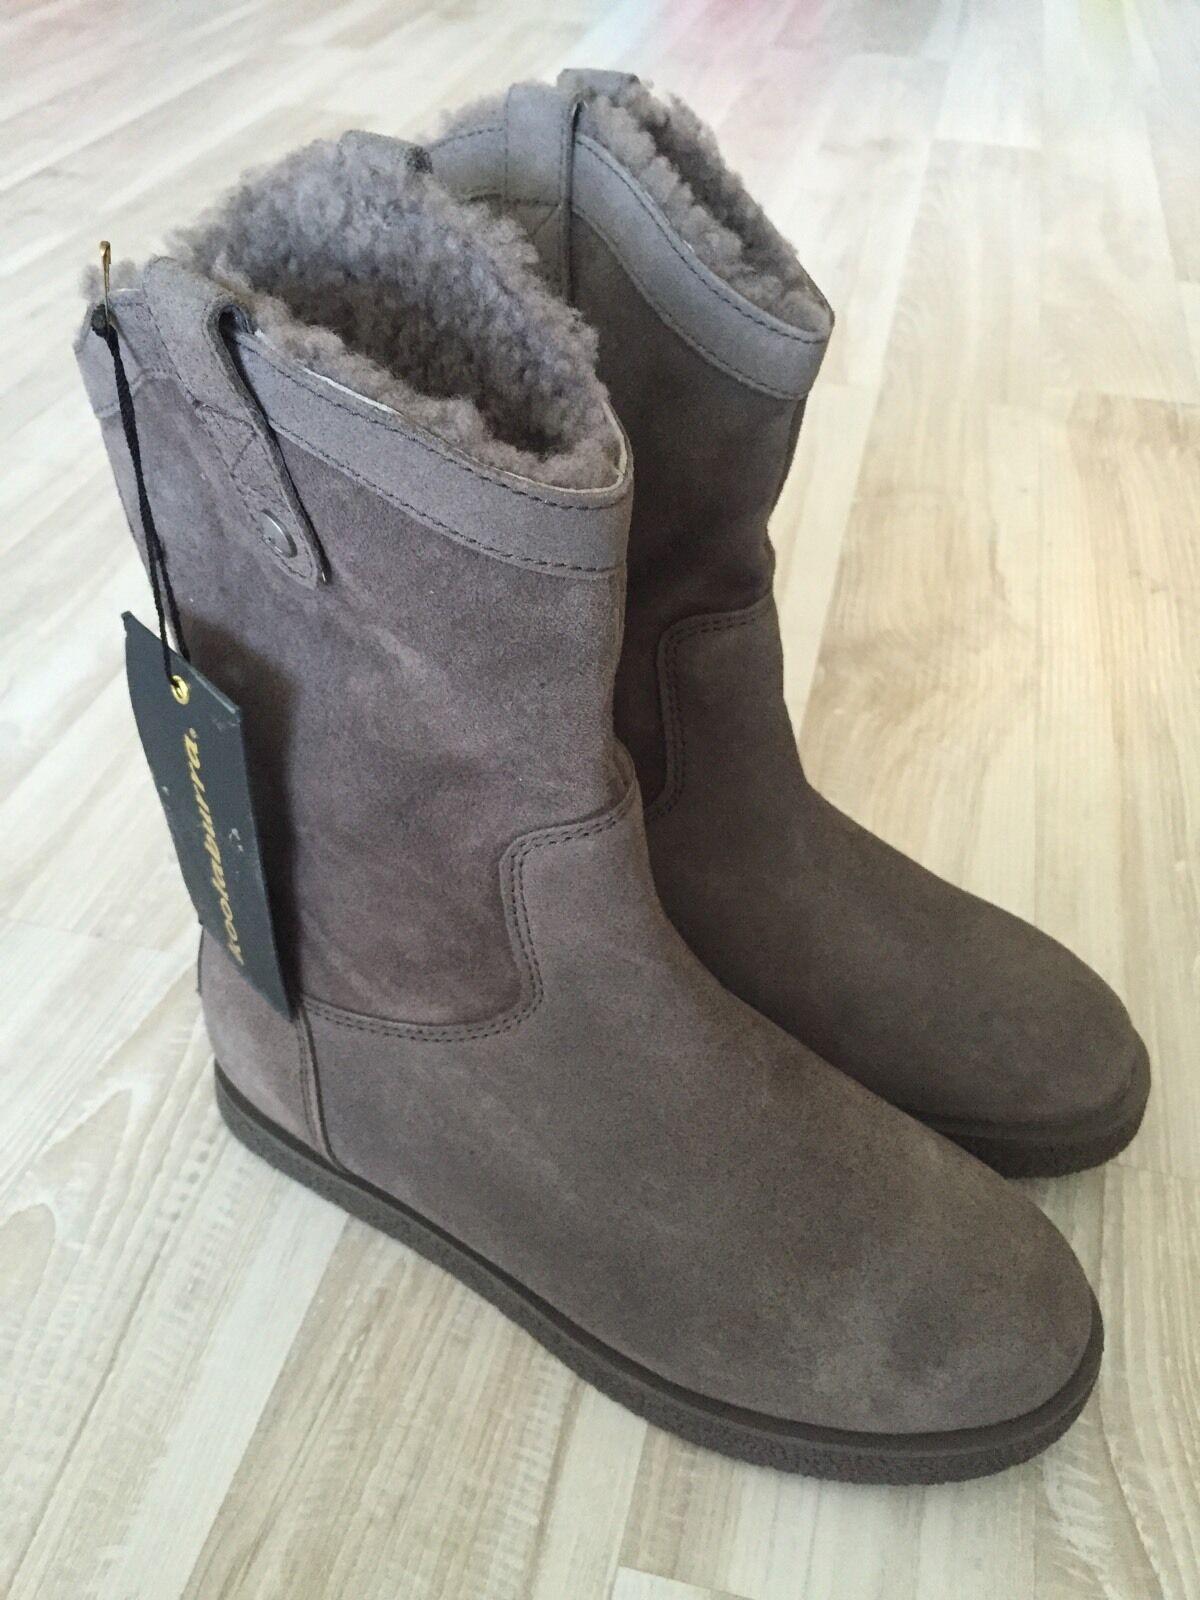 NWT NWT NWT Koolaburra Josie Grey Crepe Flat Twinface Boot size 10  286 53f3d6